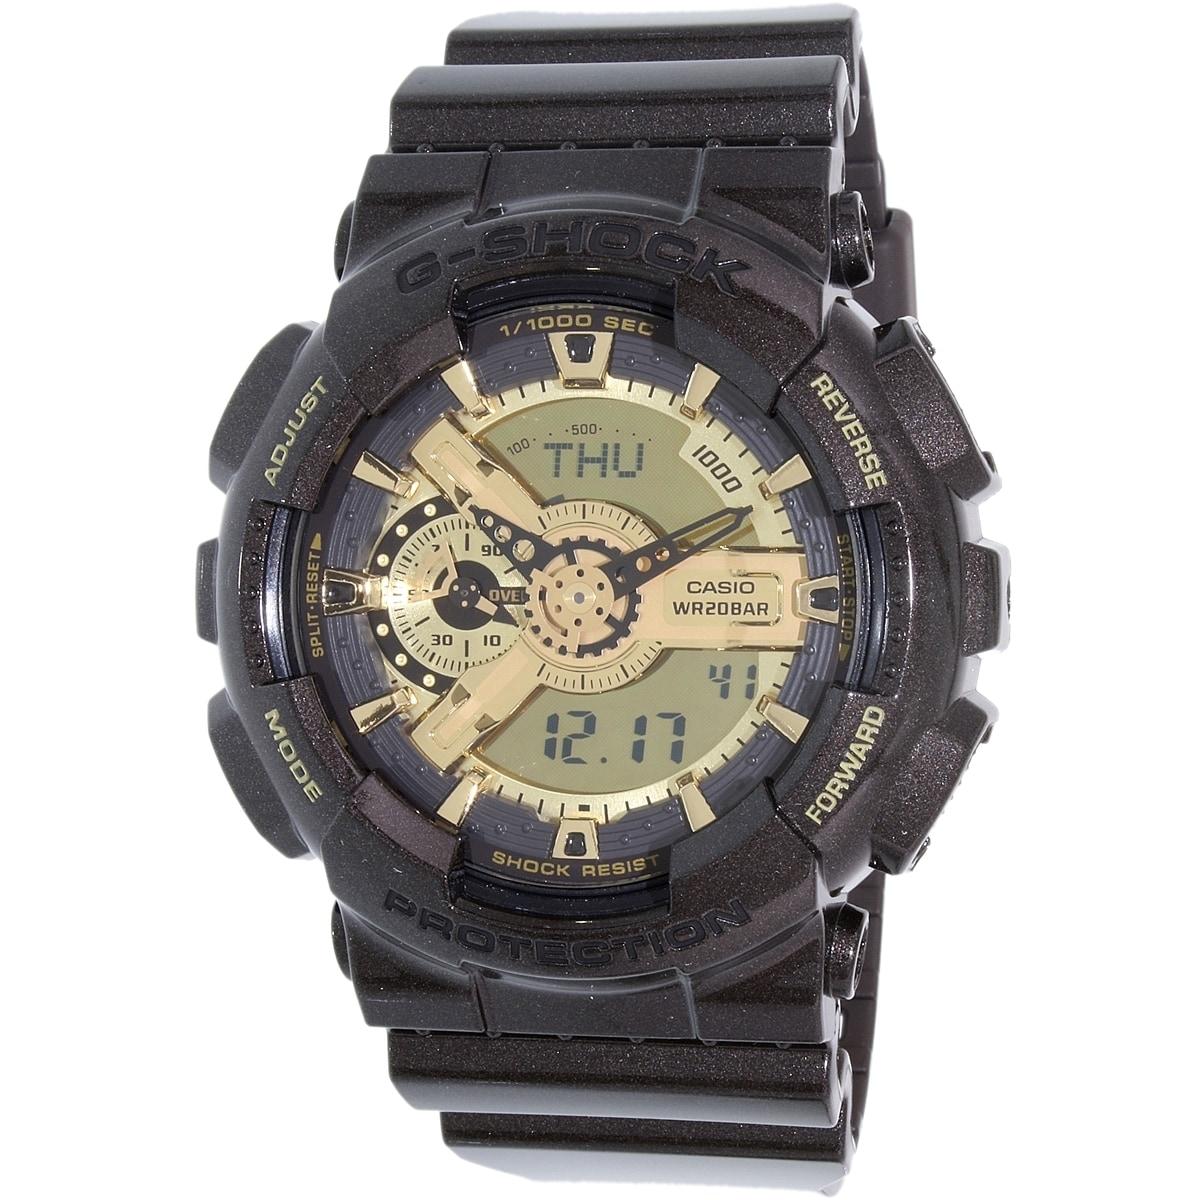 Casio Men's G-Shock GA110BR-5A Black Resin Quartz Watch (...